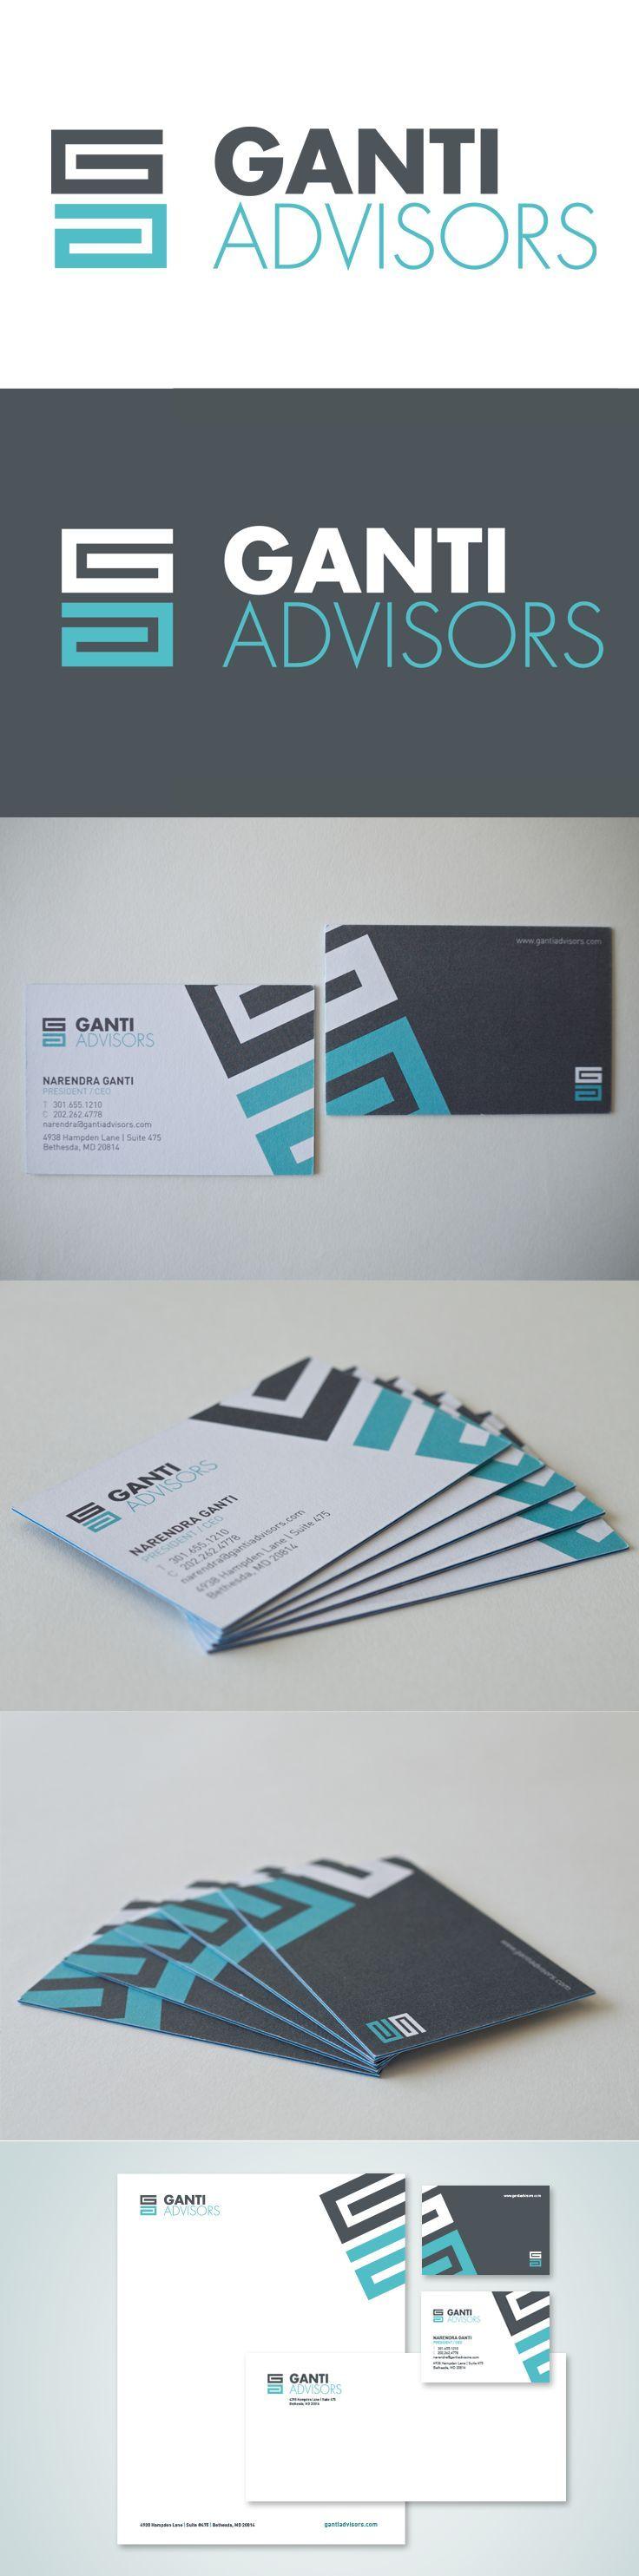 Ganti Advisors Corporate Identity by Marstudio © www.marstudio.com - Financial Logo - Corporate Collateral - Print Collateral: